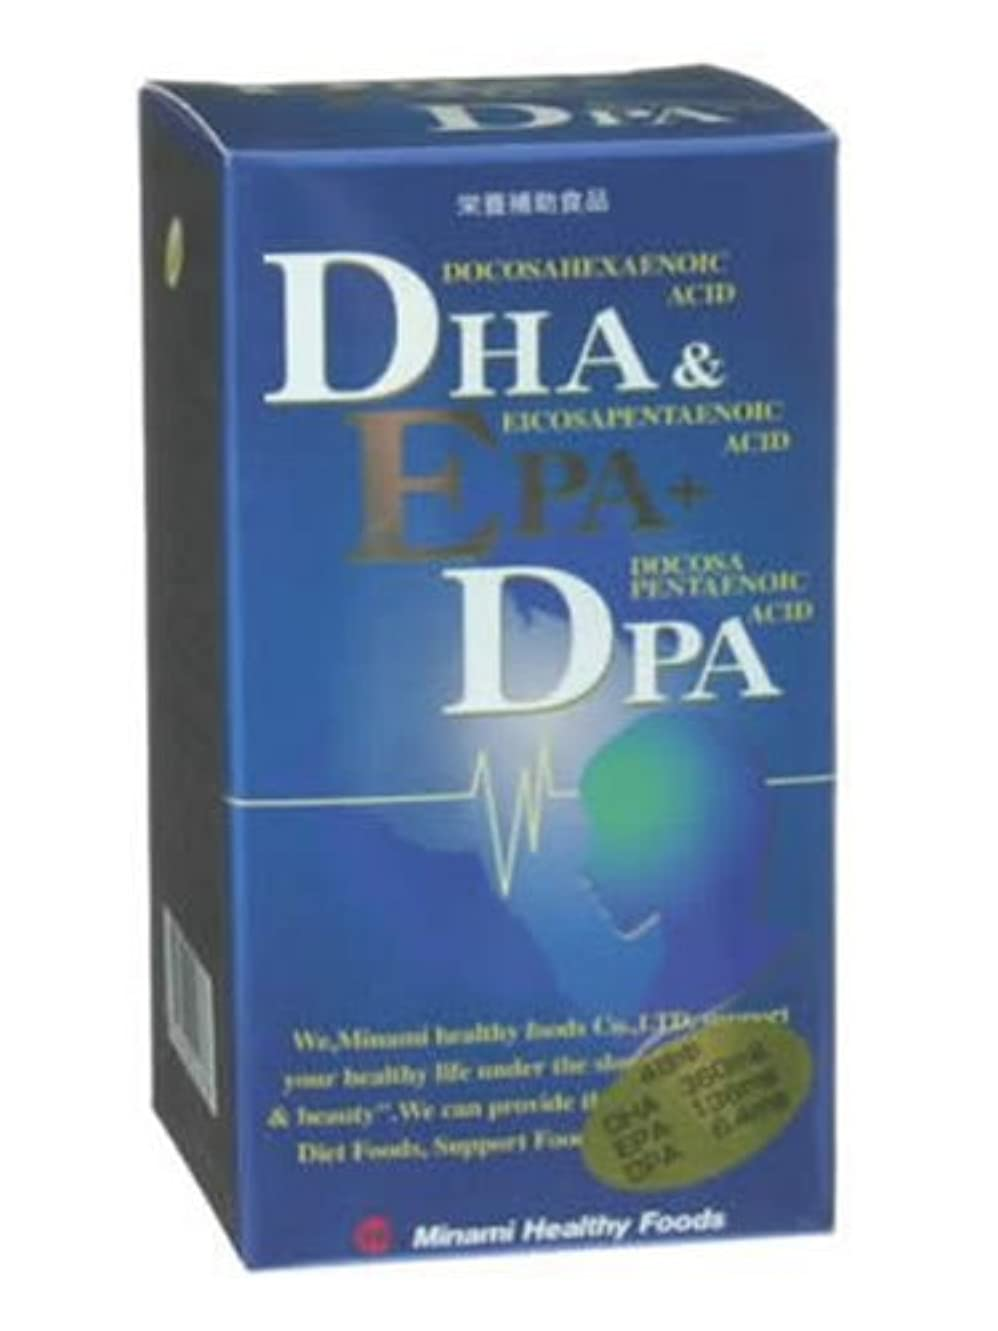 DHA&EPA+DPA 120粒 約30日分